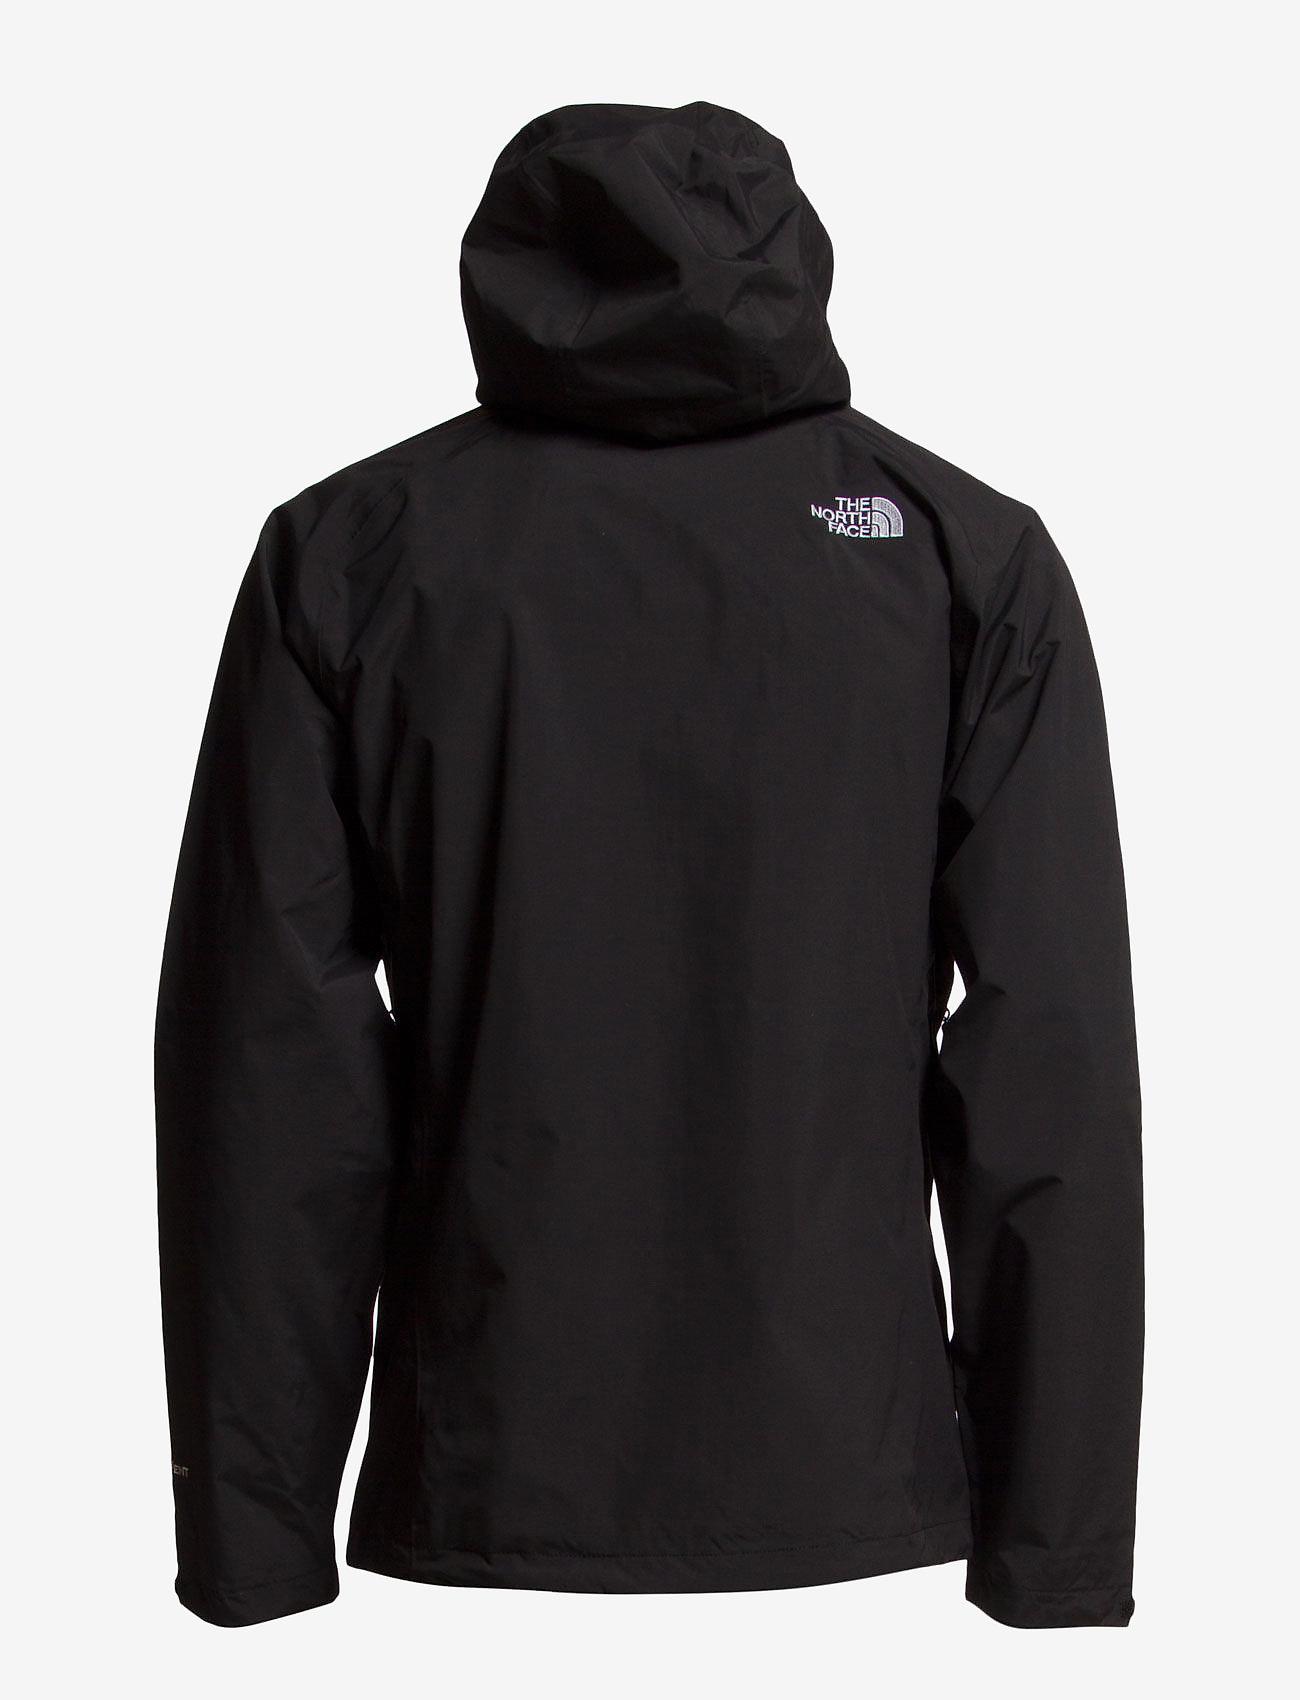 The North Face - M STRATOS JACKET - kurtki turystyczne - tnf black - 1